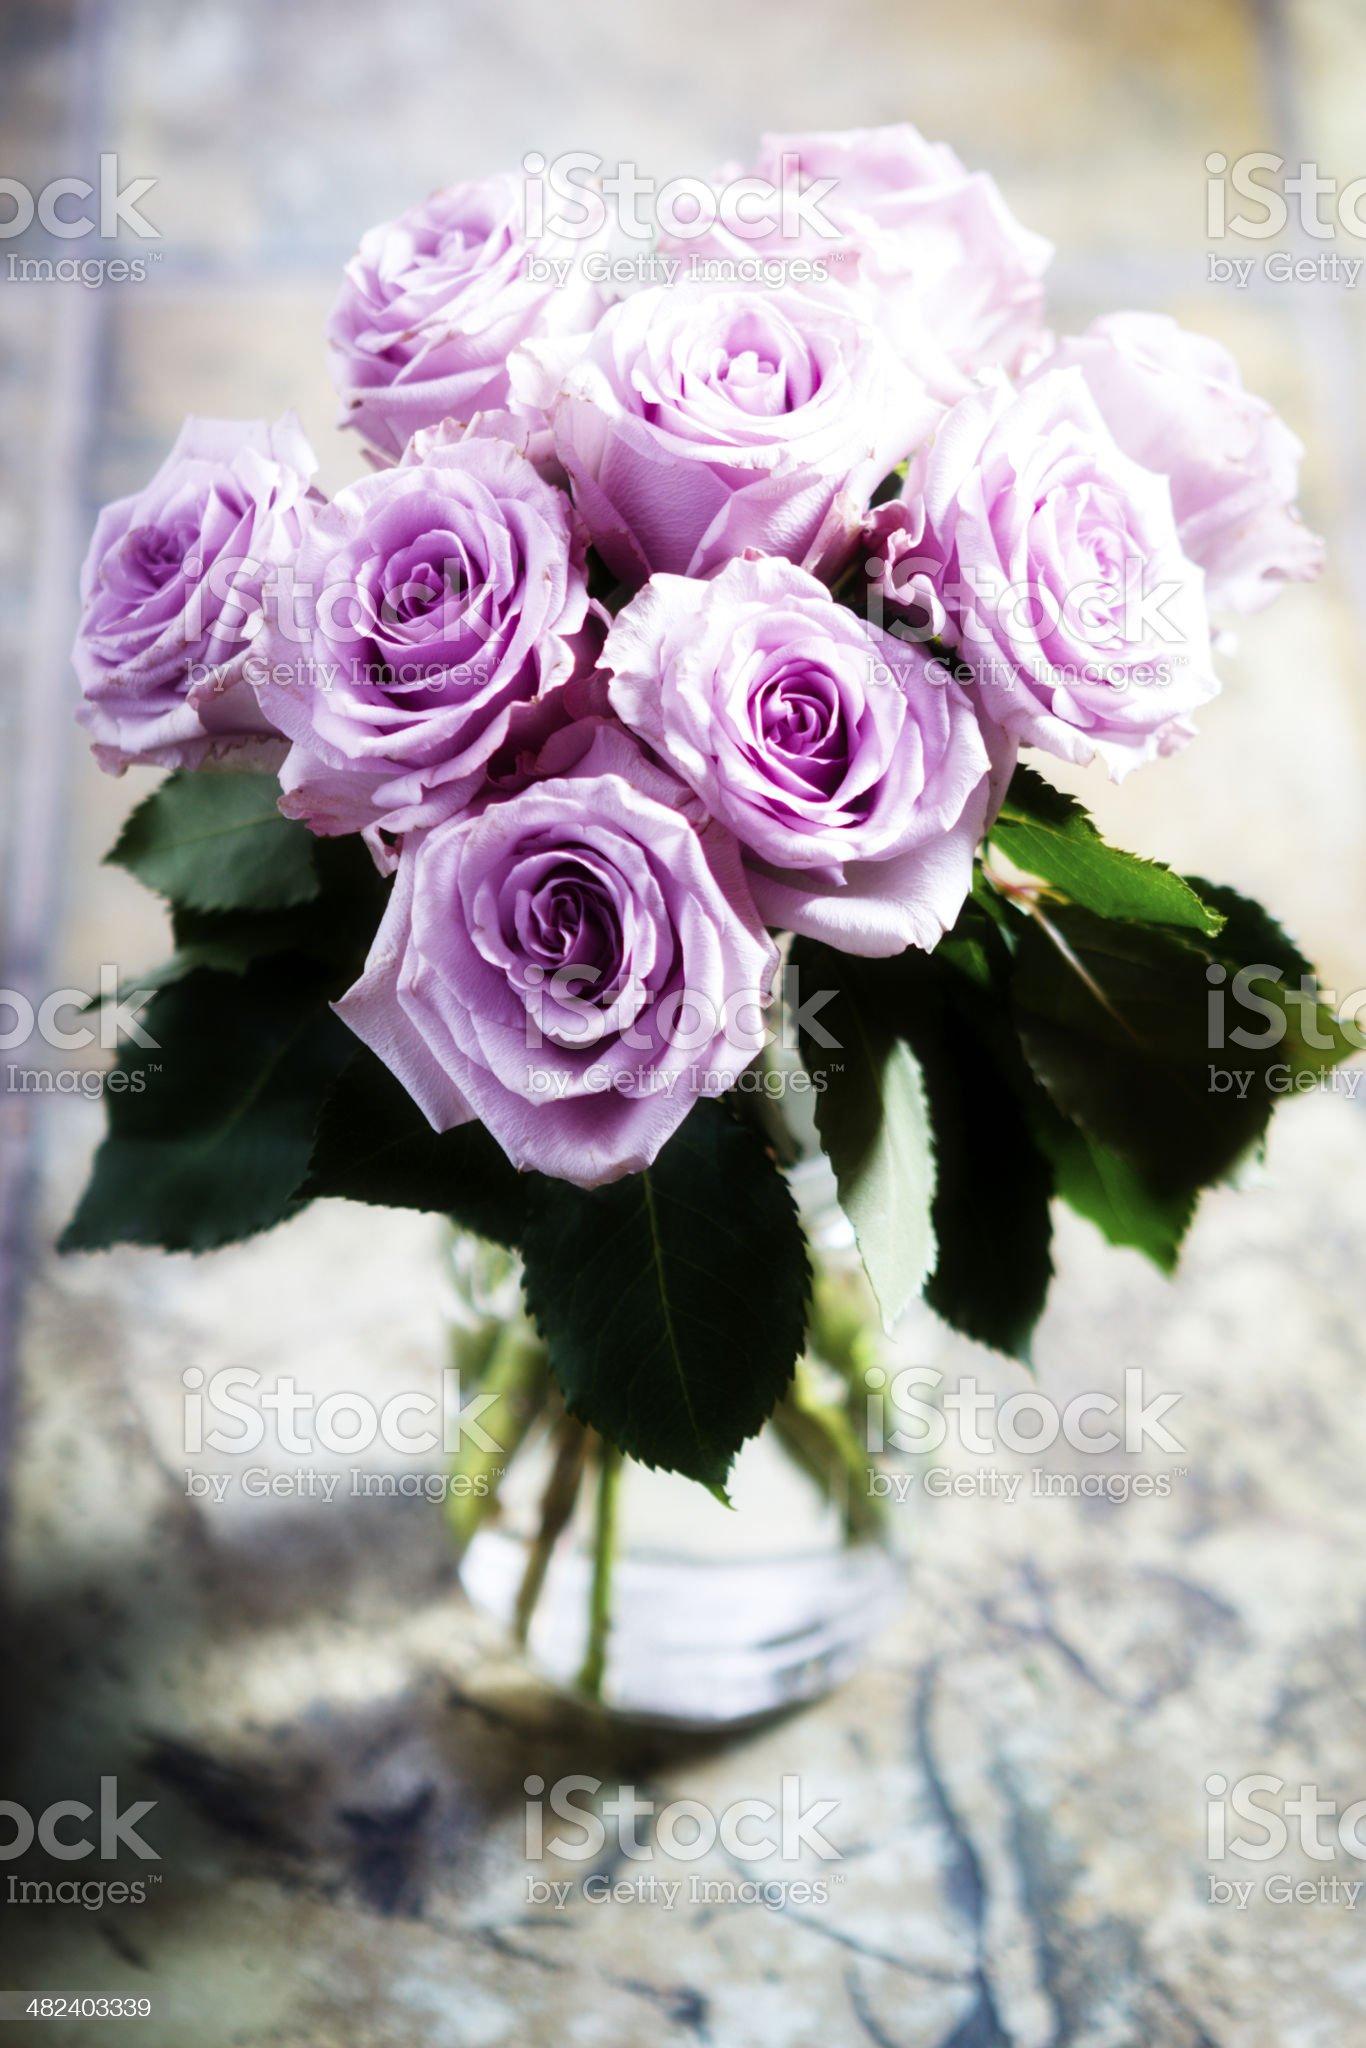 Shabby chic roses royalty-free stock photo